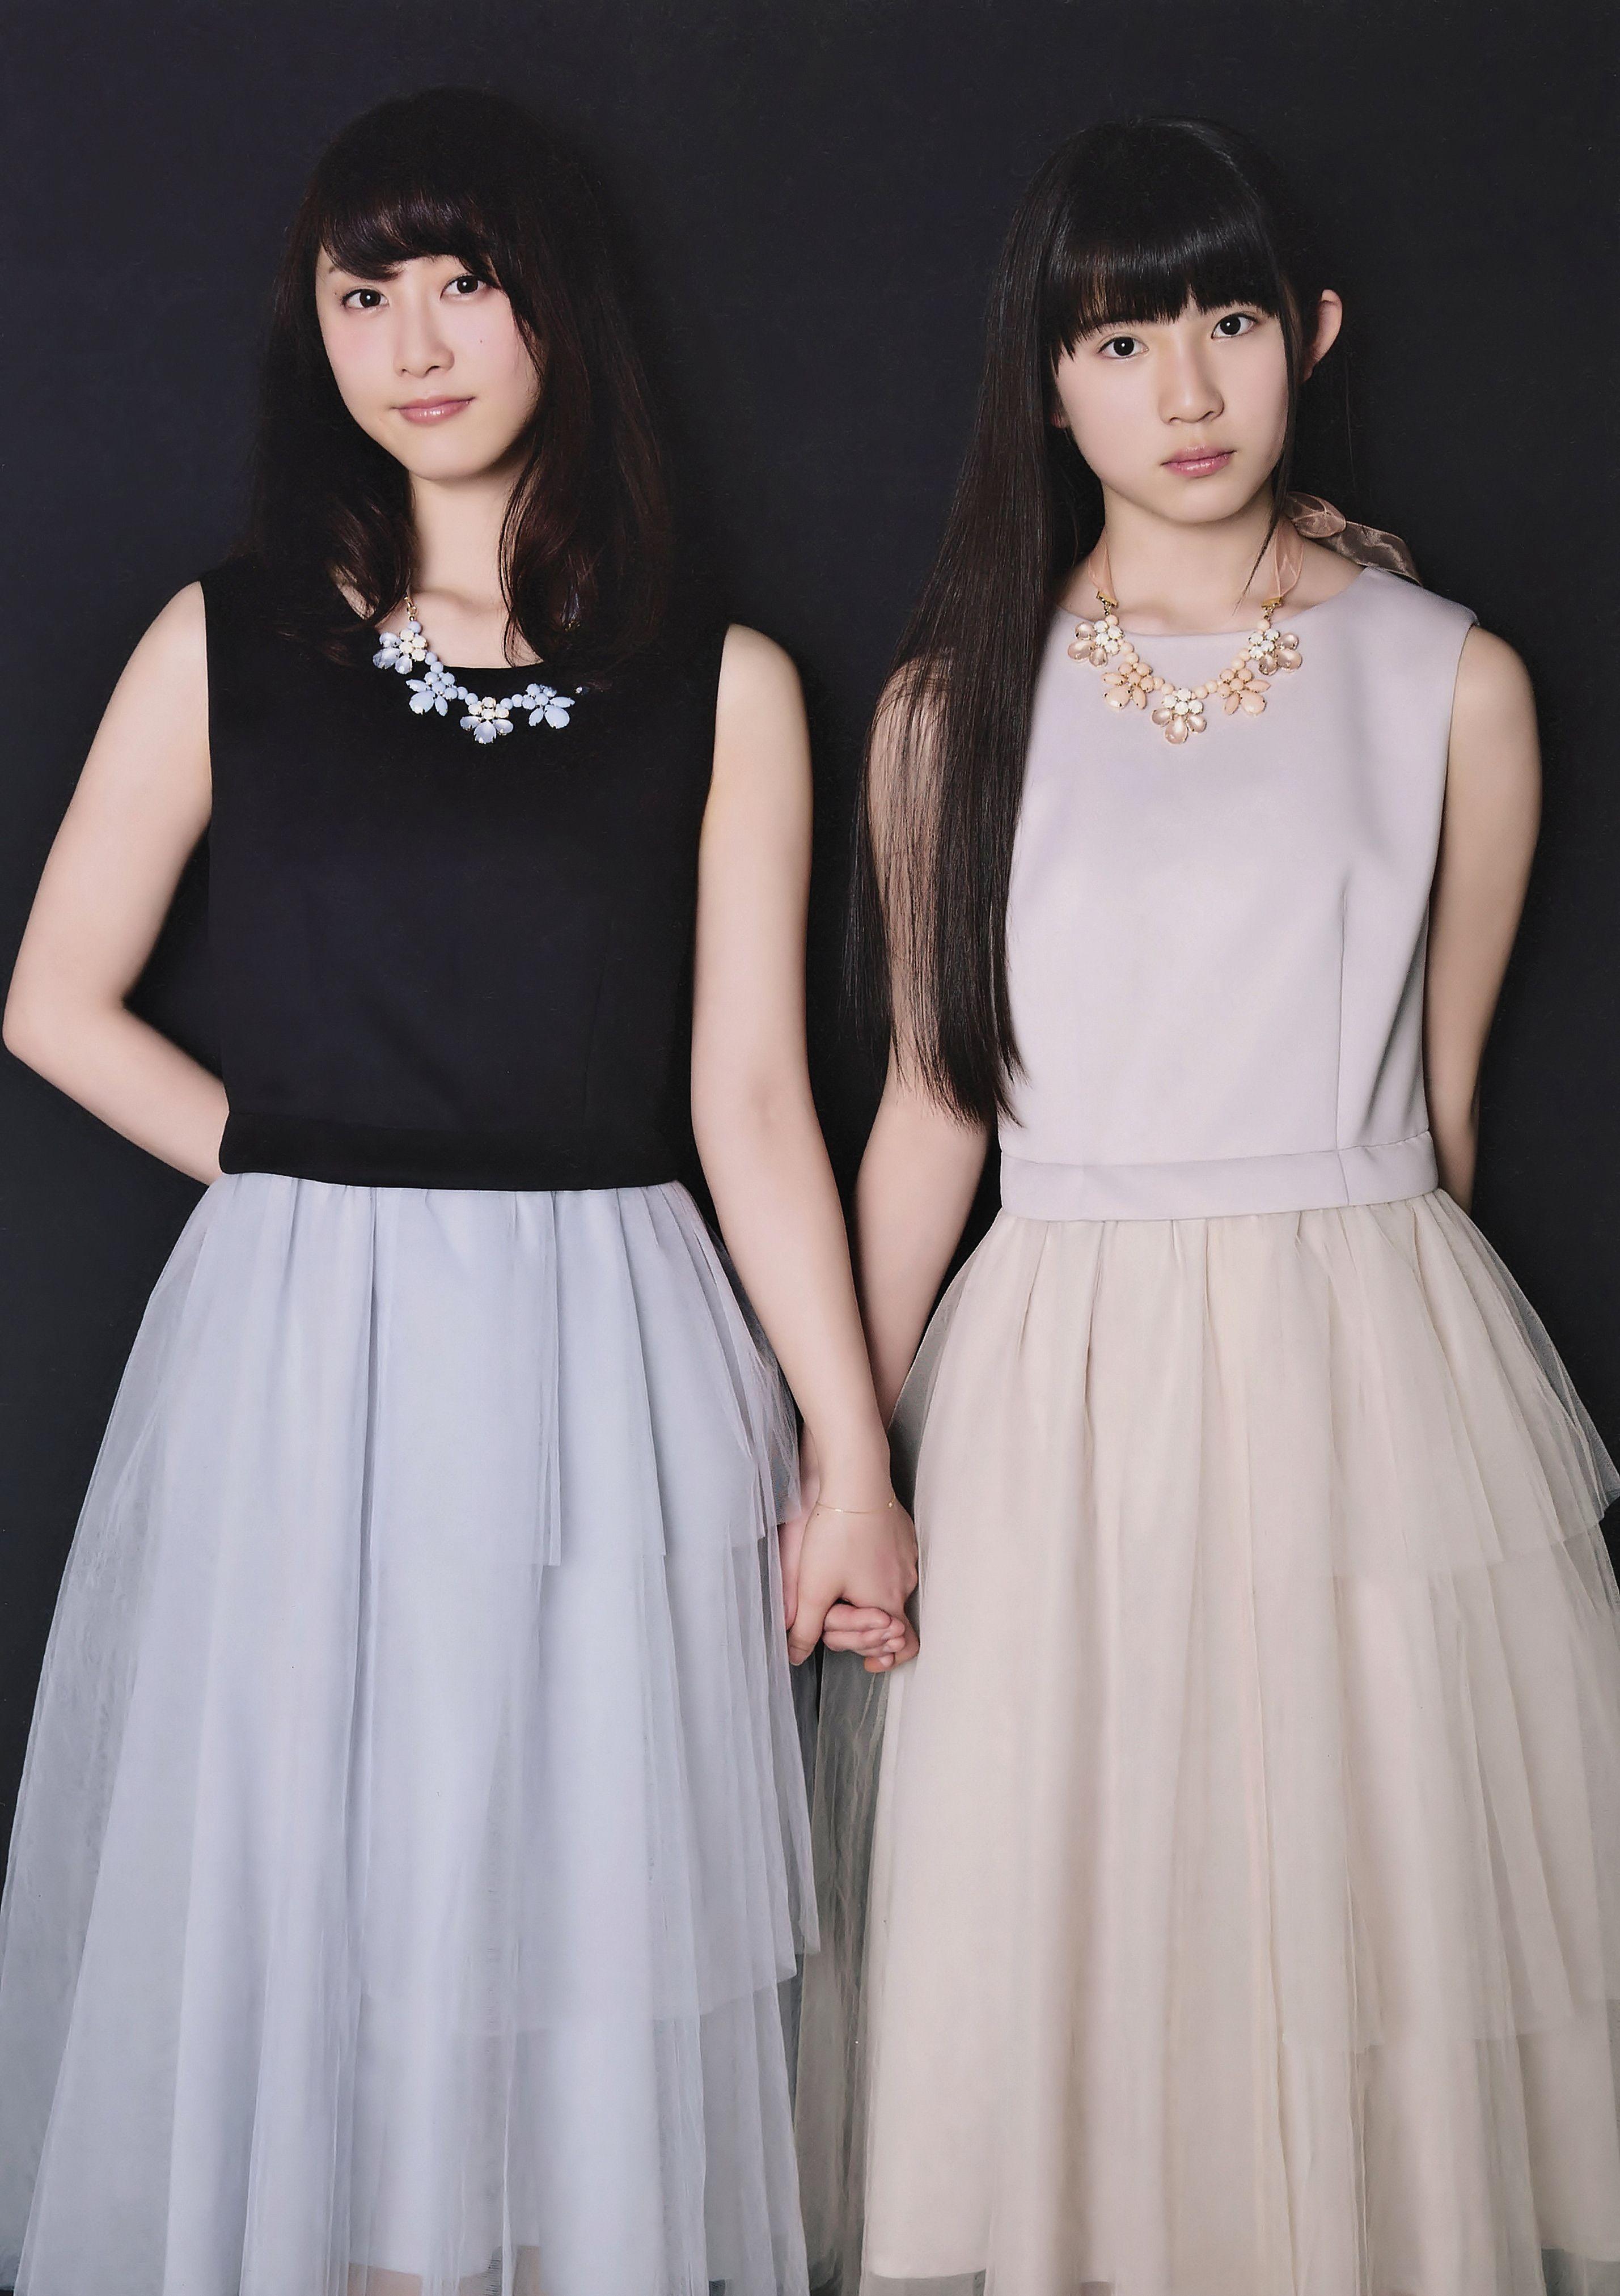 Matsui Rena, Jun Aonami